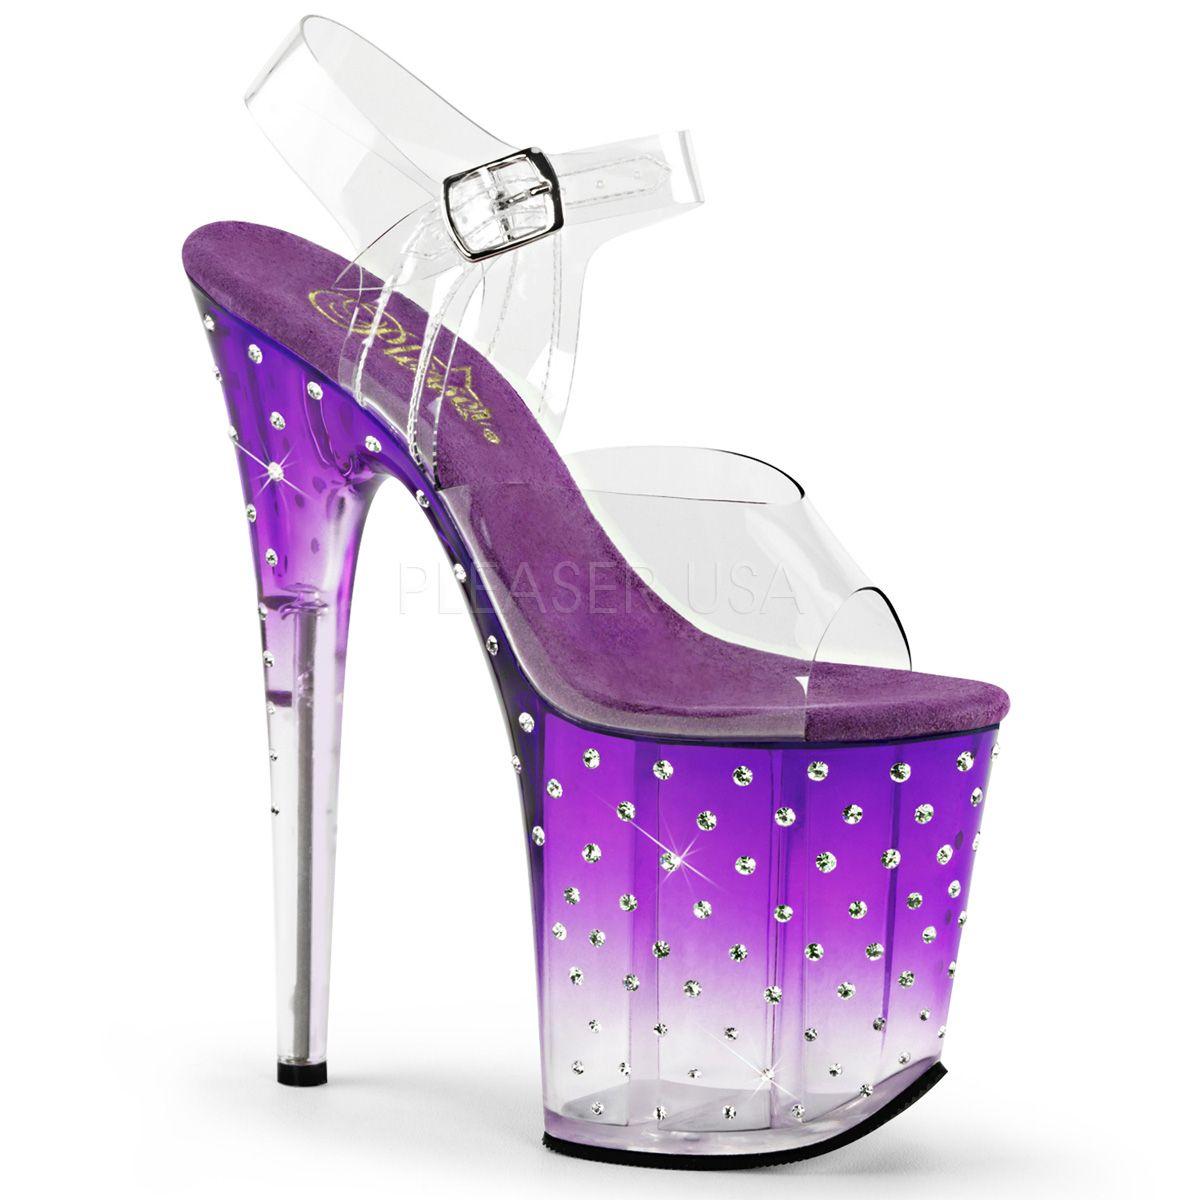 40300a6c090 Pleaser Stardust-808T Stripper Heels